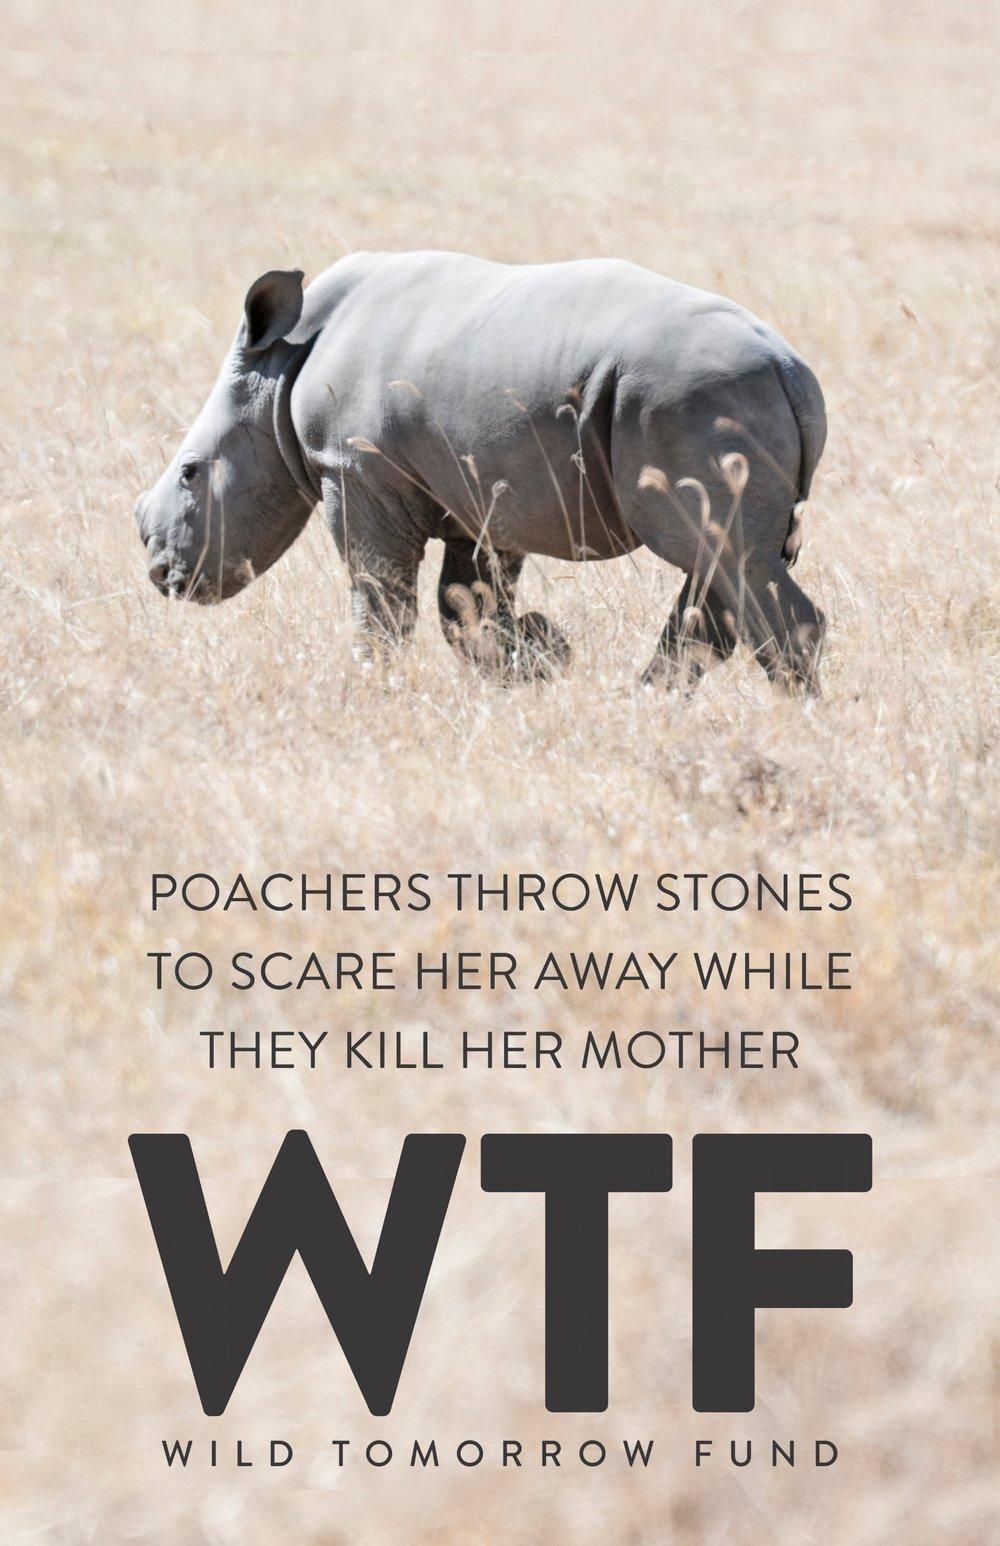 WTF poster_0004_baby rhino.jpg